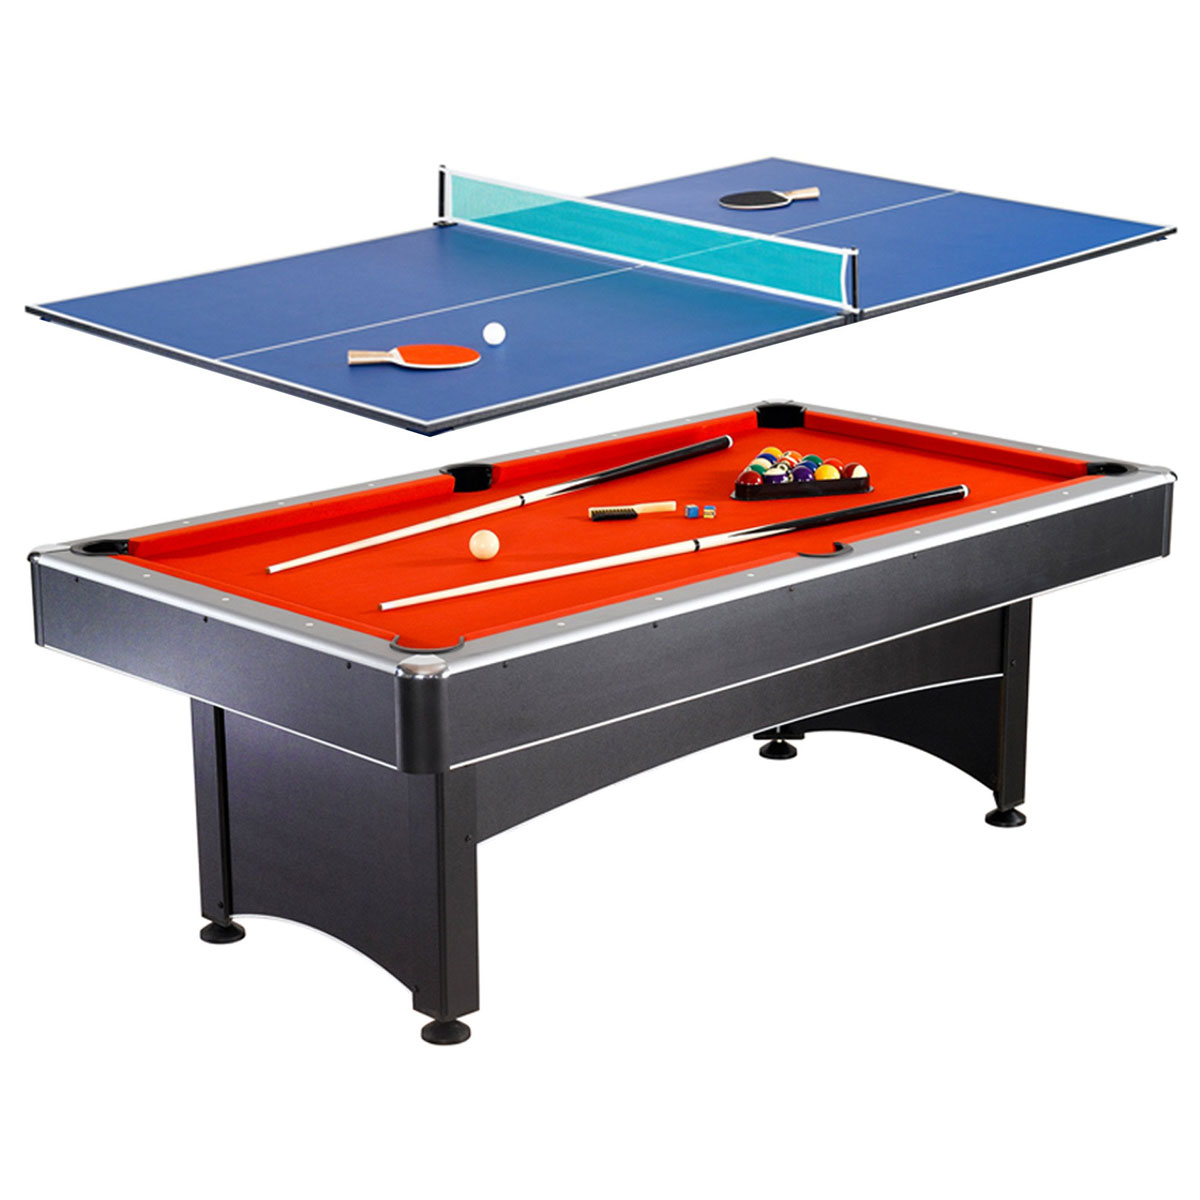 7 39 maverick pool table w table tennis - Pool table table tennis ...